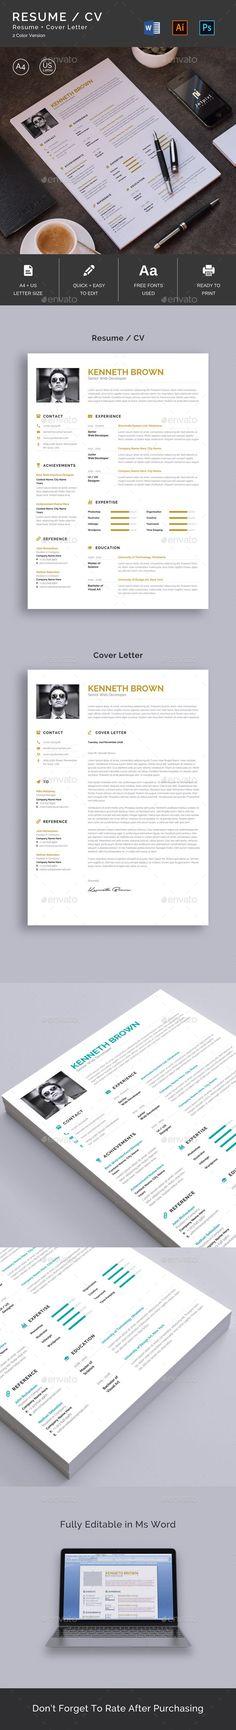 Resume Template PSD, AI Illustrator, MS Phrase - & Letter Paper Measurement - Obtain: graphicriver. Illustrator Resume obtain Best Free Resume Templates, Modern Resume Template, Cv Template, Cv Design, Resume Design, Resume Cv, Branding Design, Best Resume Format, Cv Format